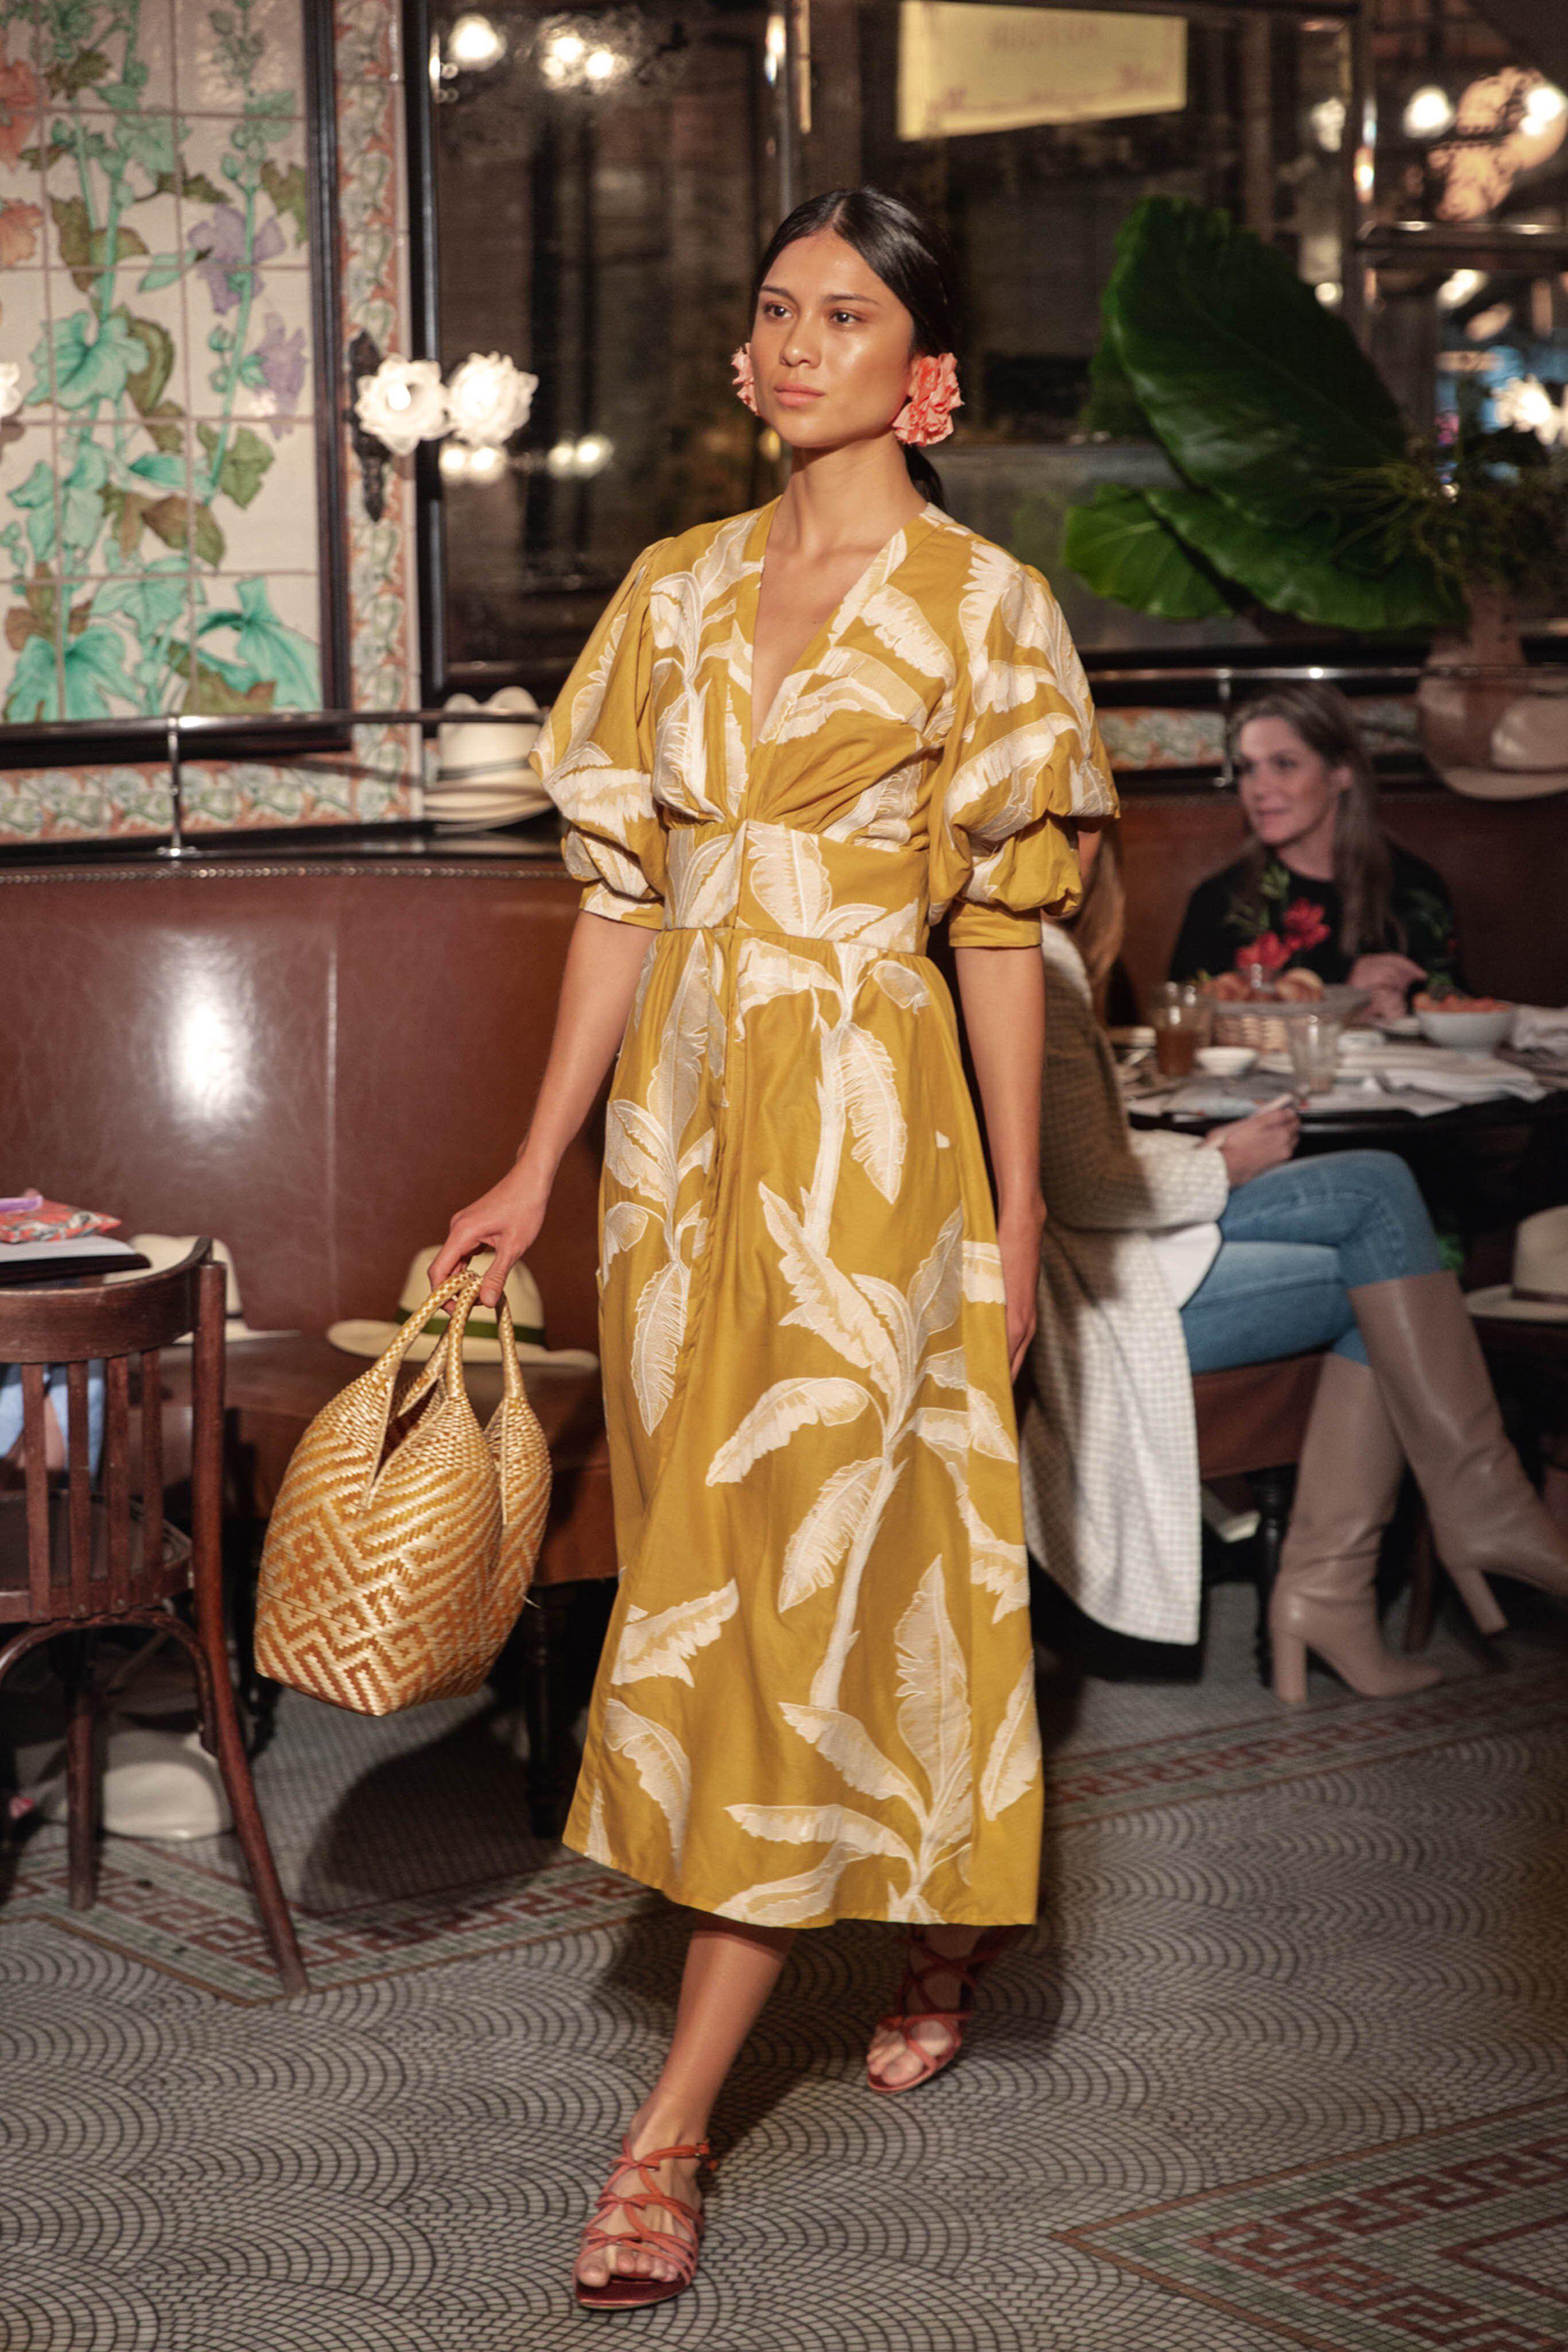 Johanna Ortiz Resort 16 Fashion Show Collection: See the